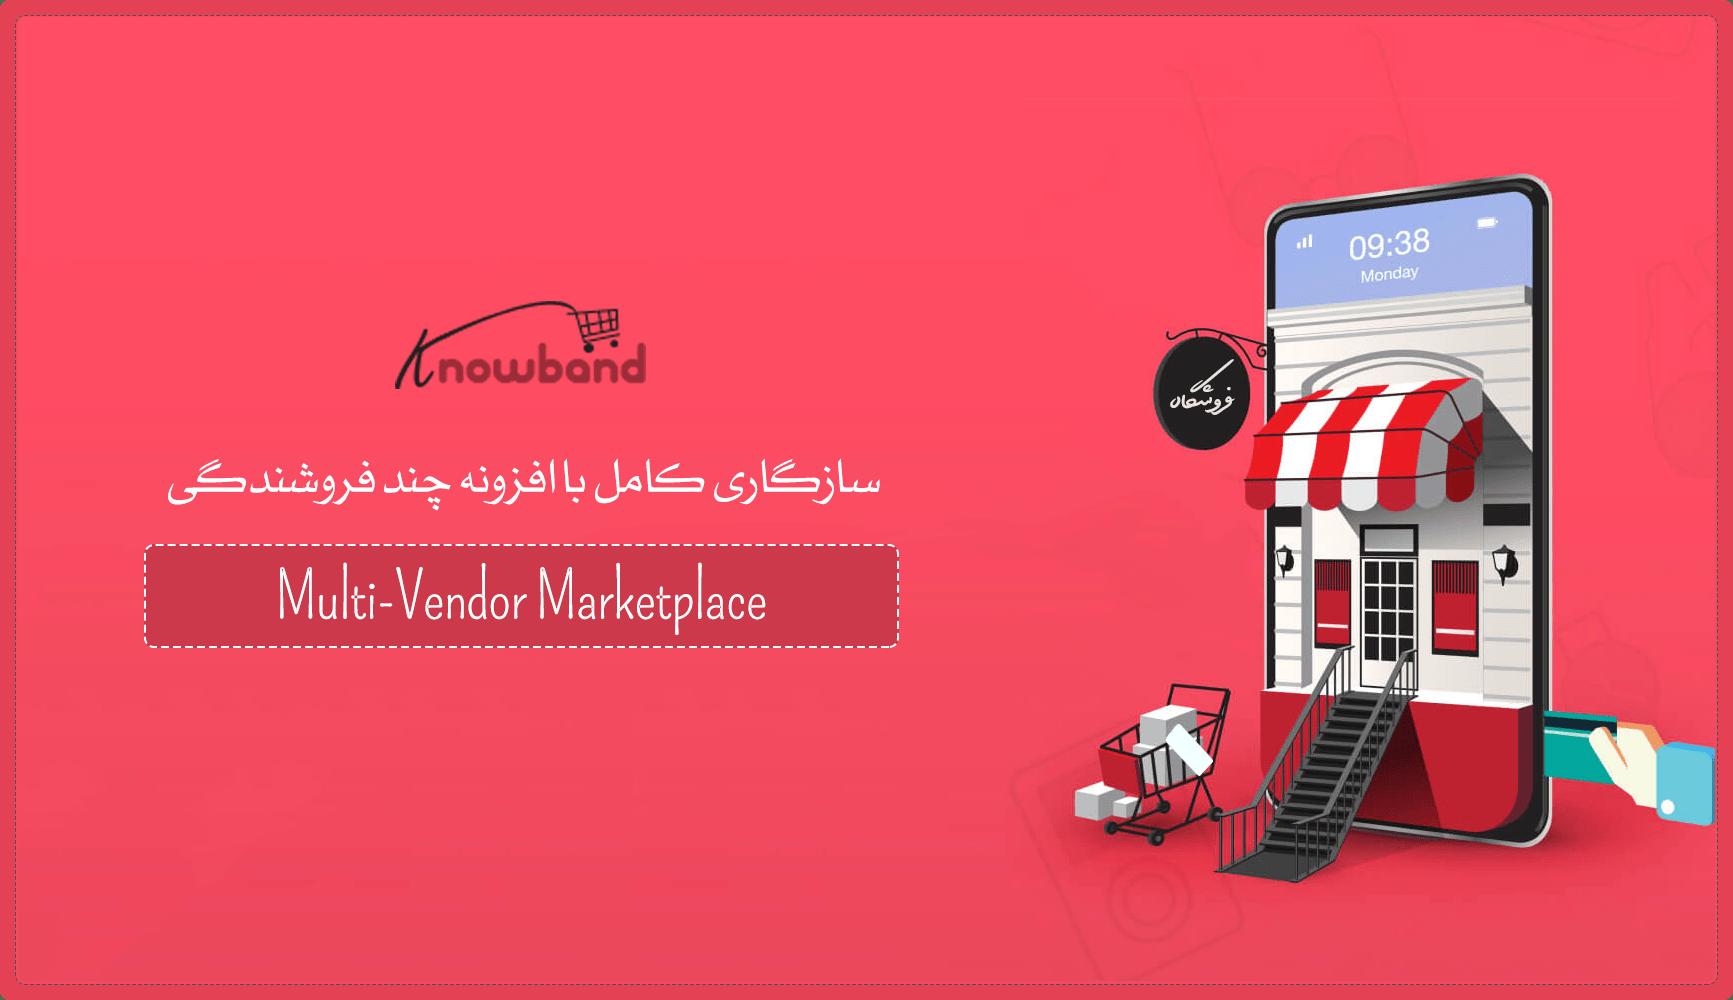 multi vendor marketplace ماژول پرستاشاپ